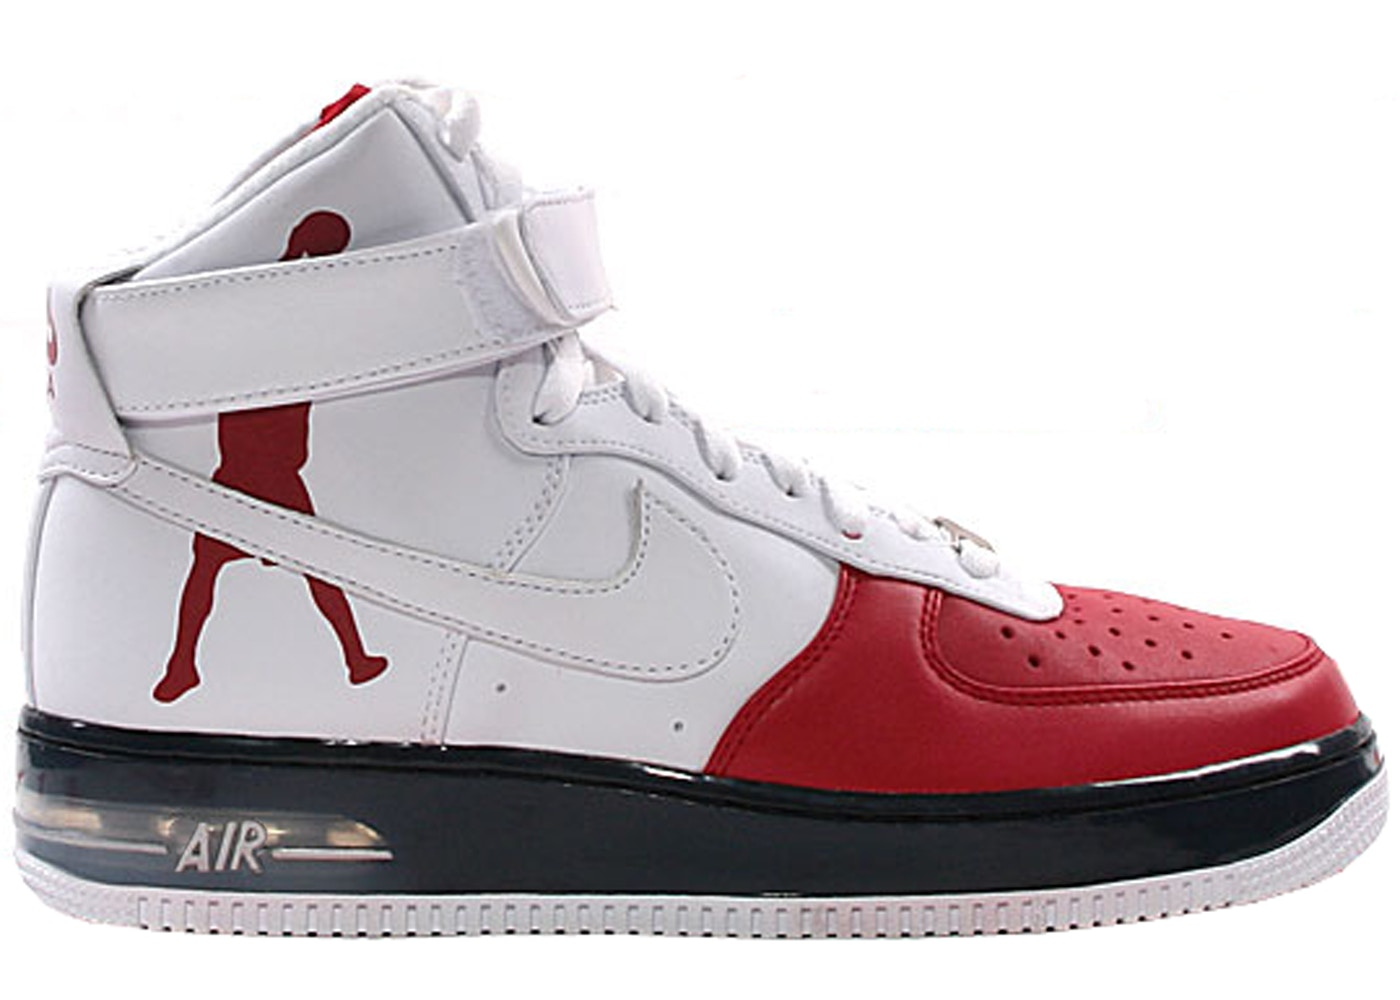 Nike Air Force 1 High Sheed Red White Black 335844 611